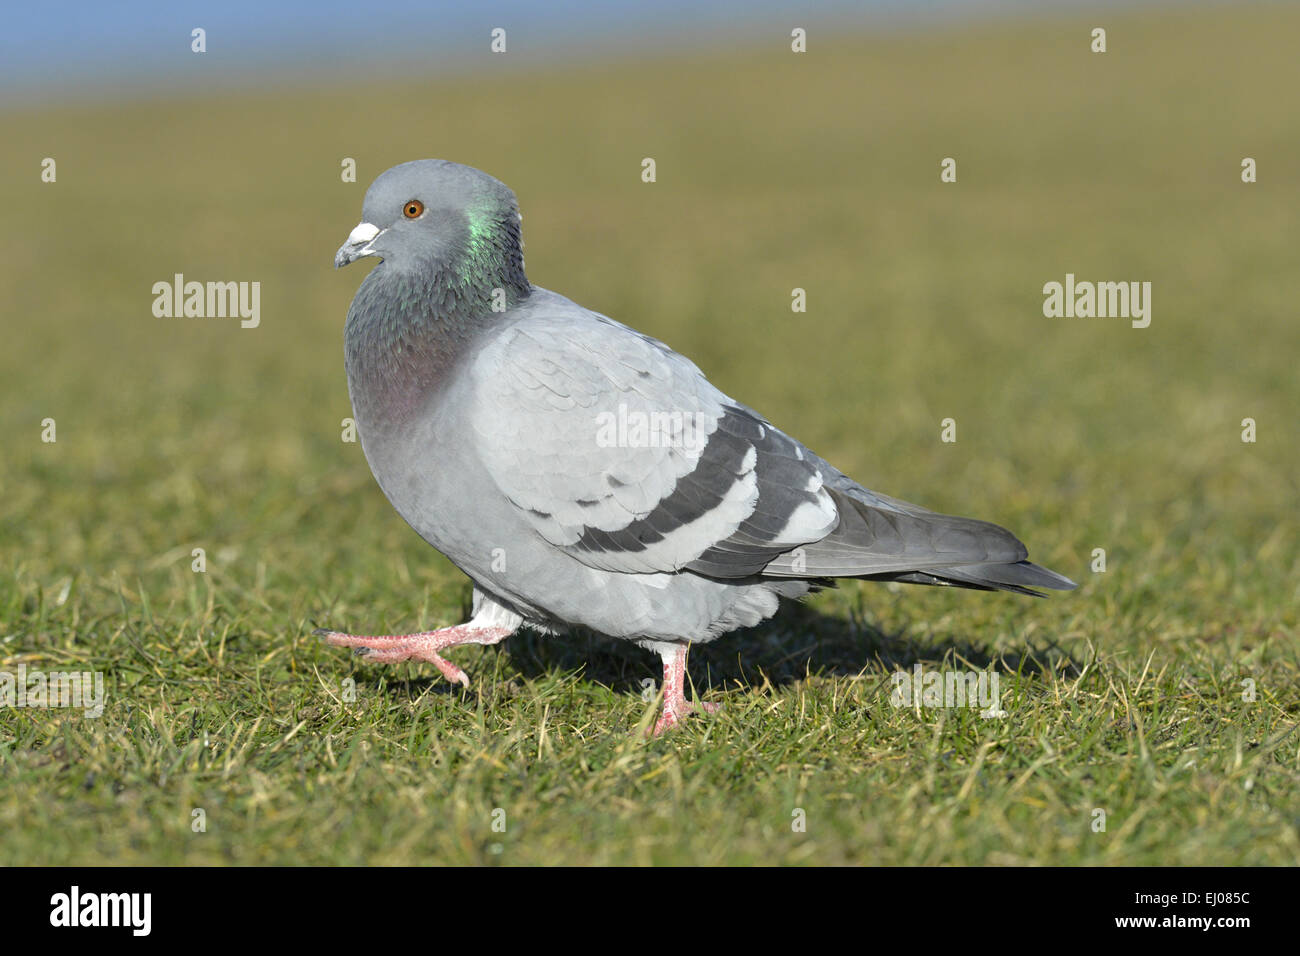 Feral Pigeon or Rock Dove - Columba livia - Stock Image